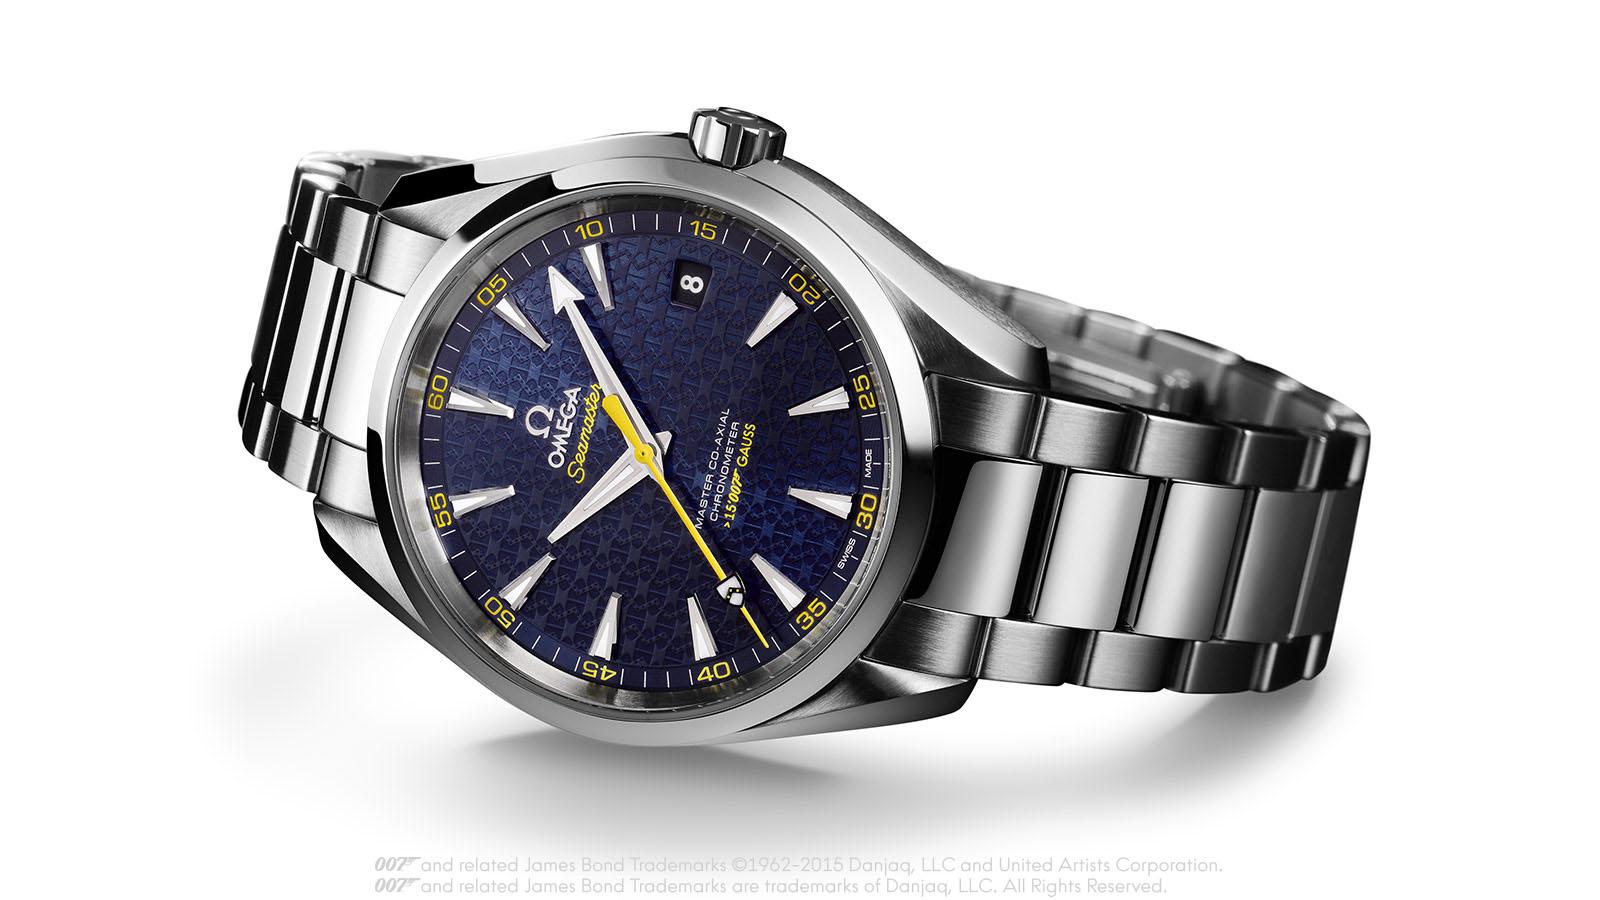 e18de60900a Omega Seamaster Aqua Terra 150m James Bond Limited Edition Men s Watch  Karachi Pakistan